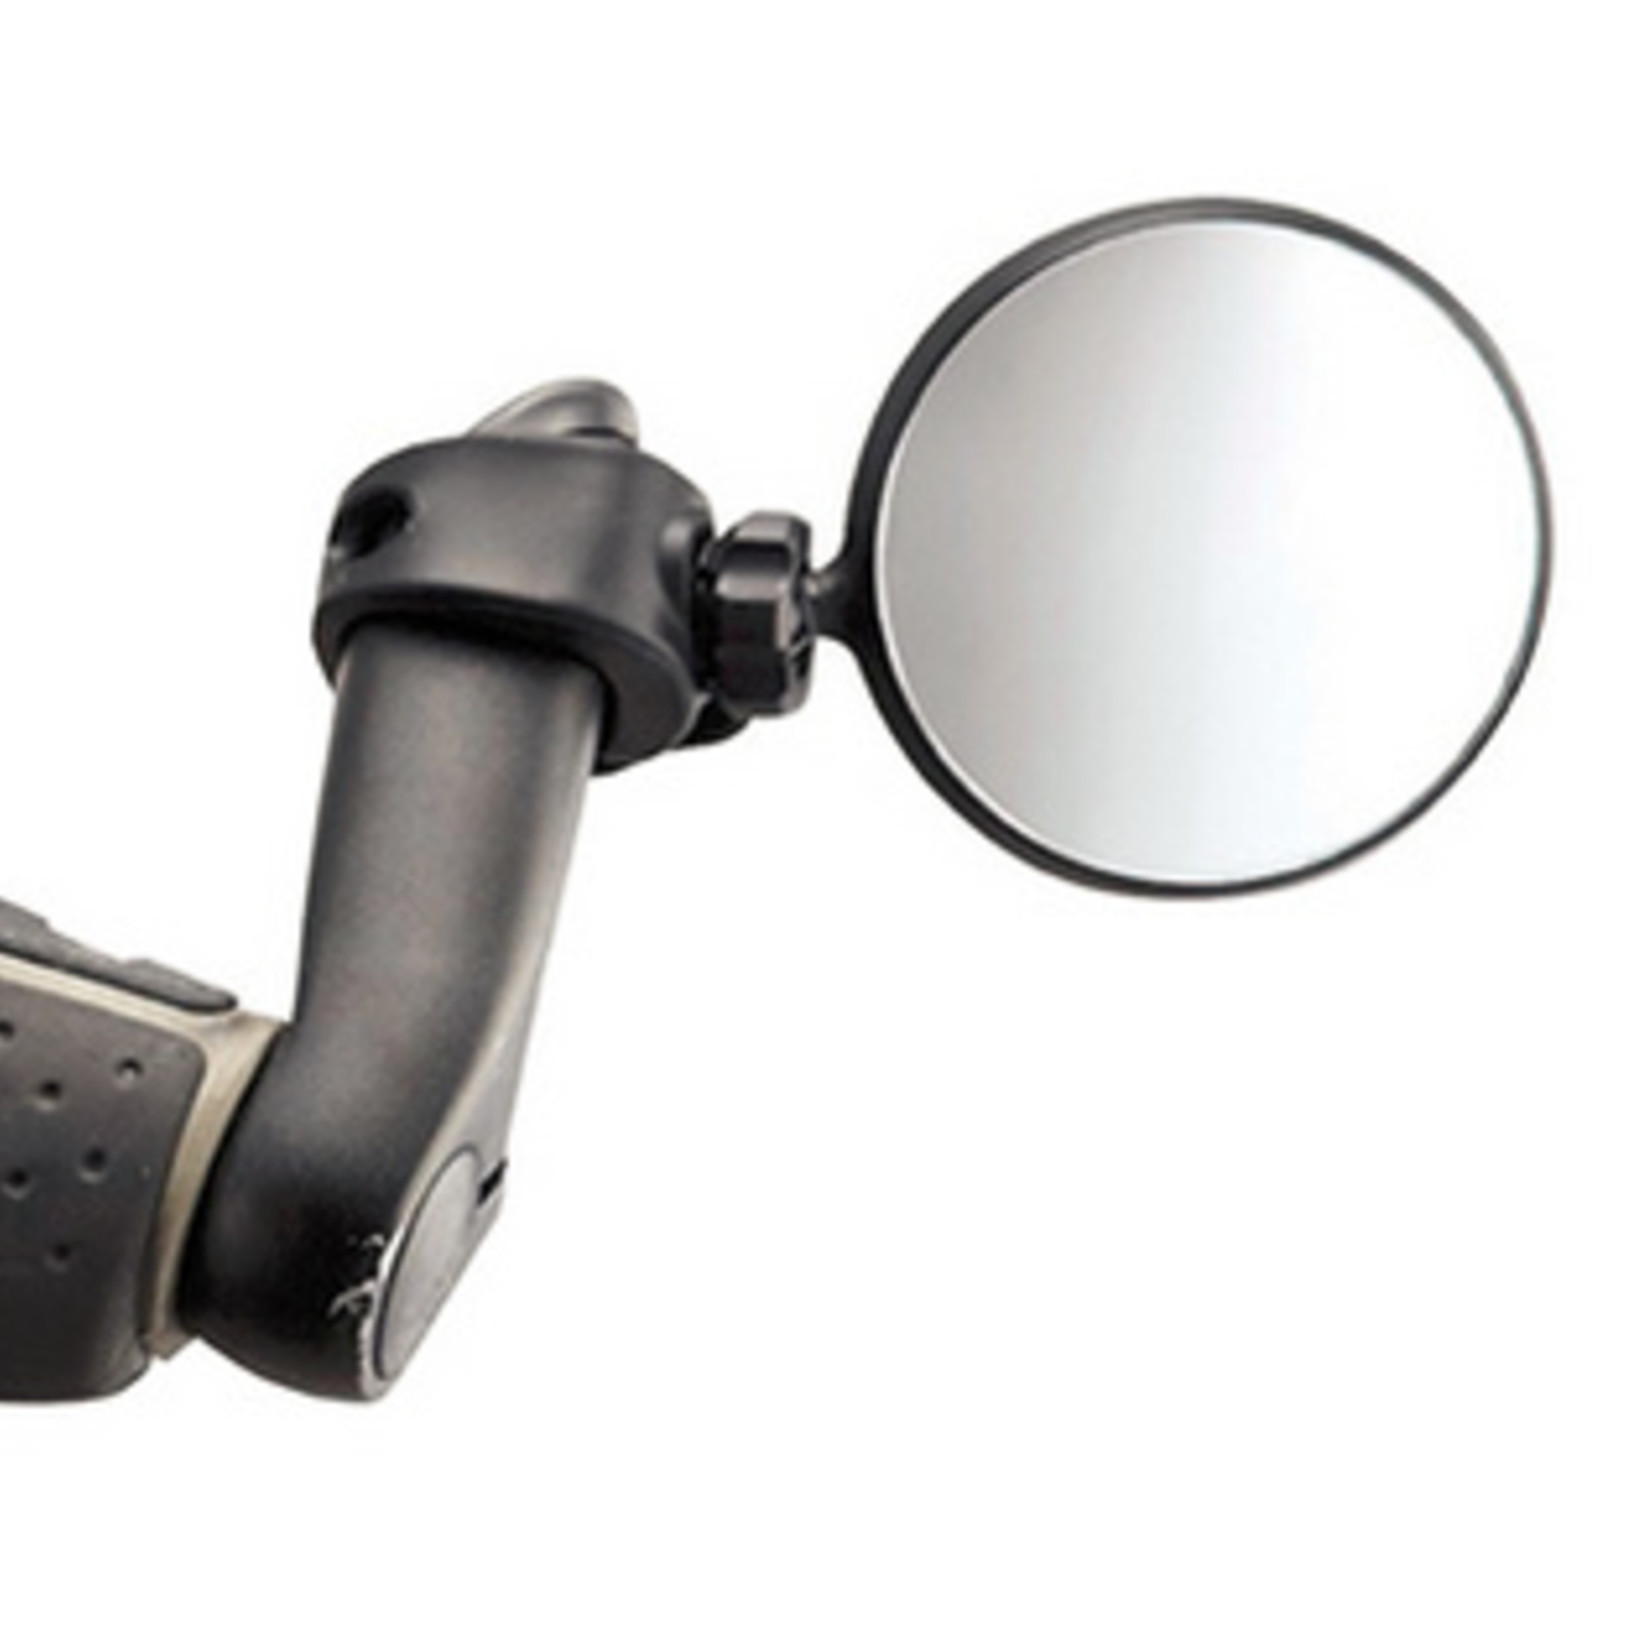 XLC Bar End Mounted Mirror MR #-K03